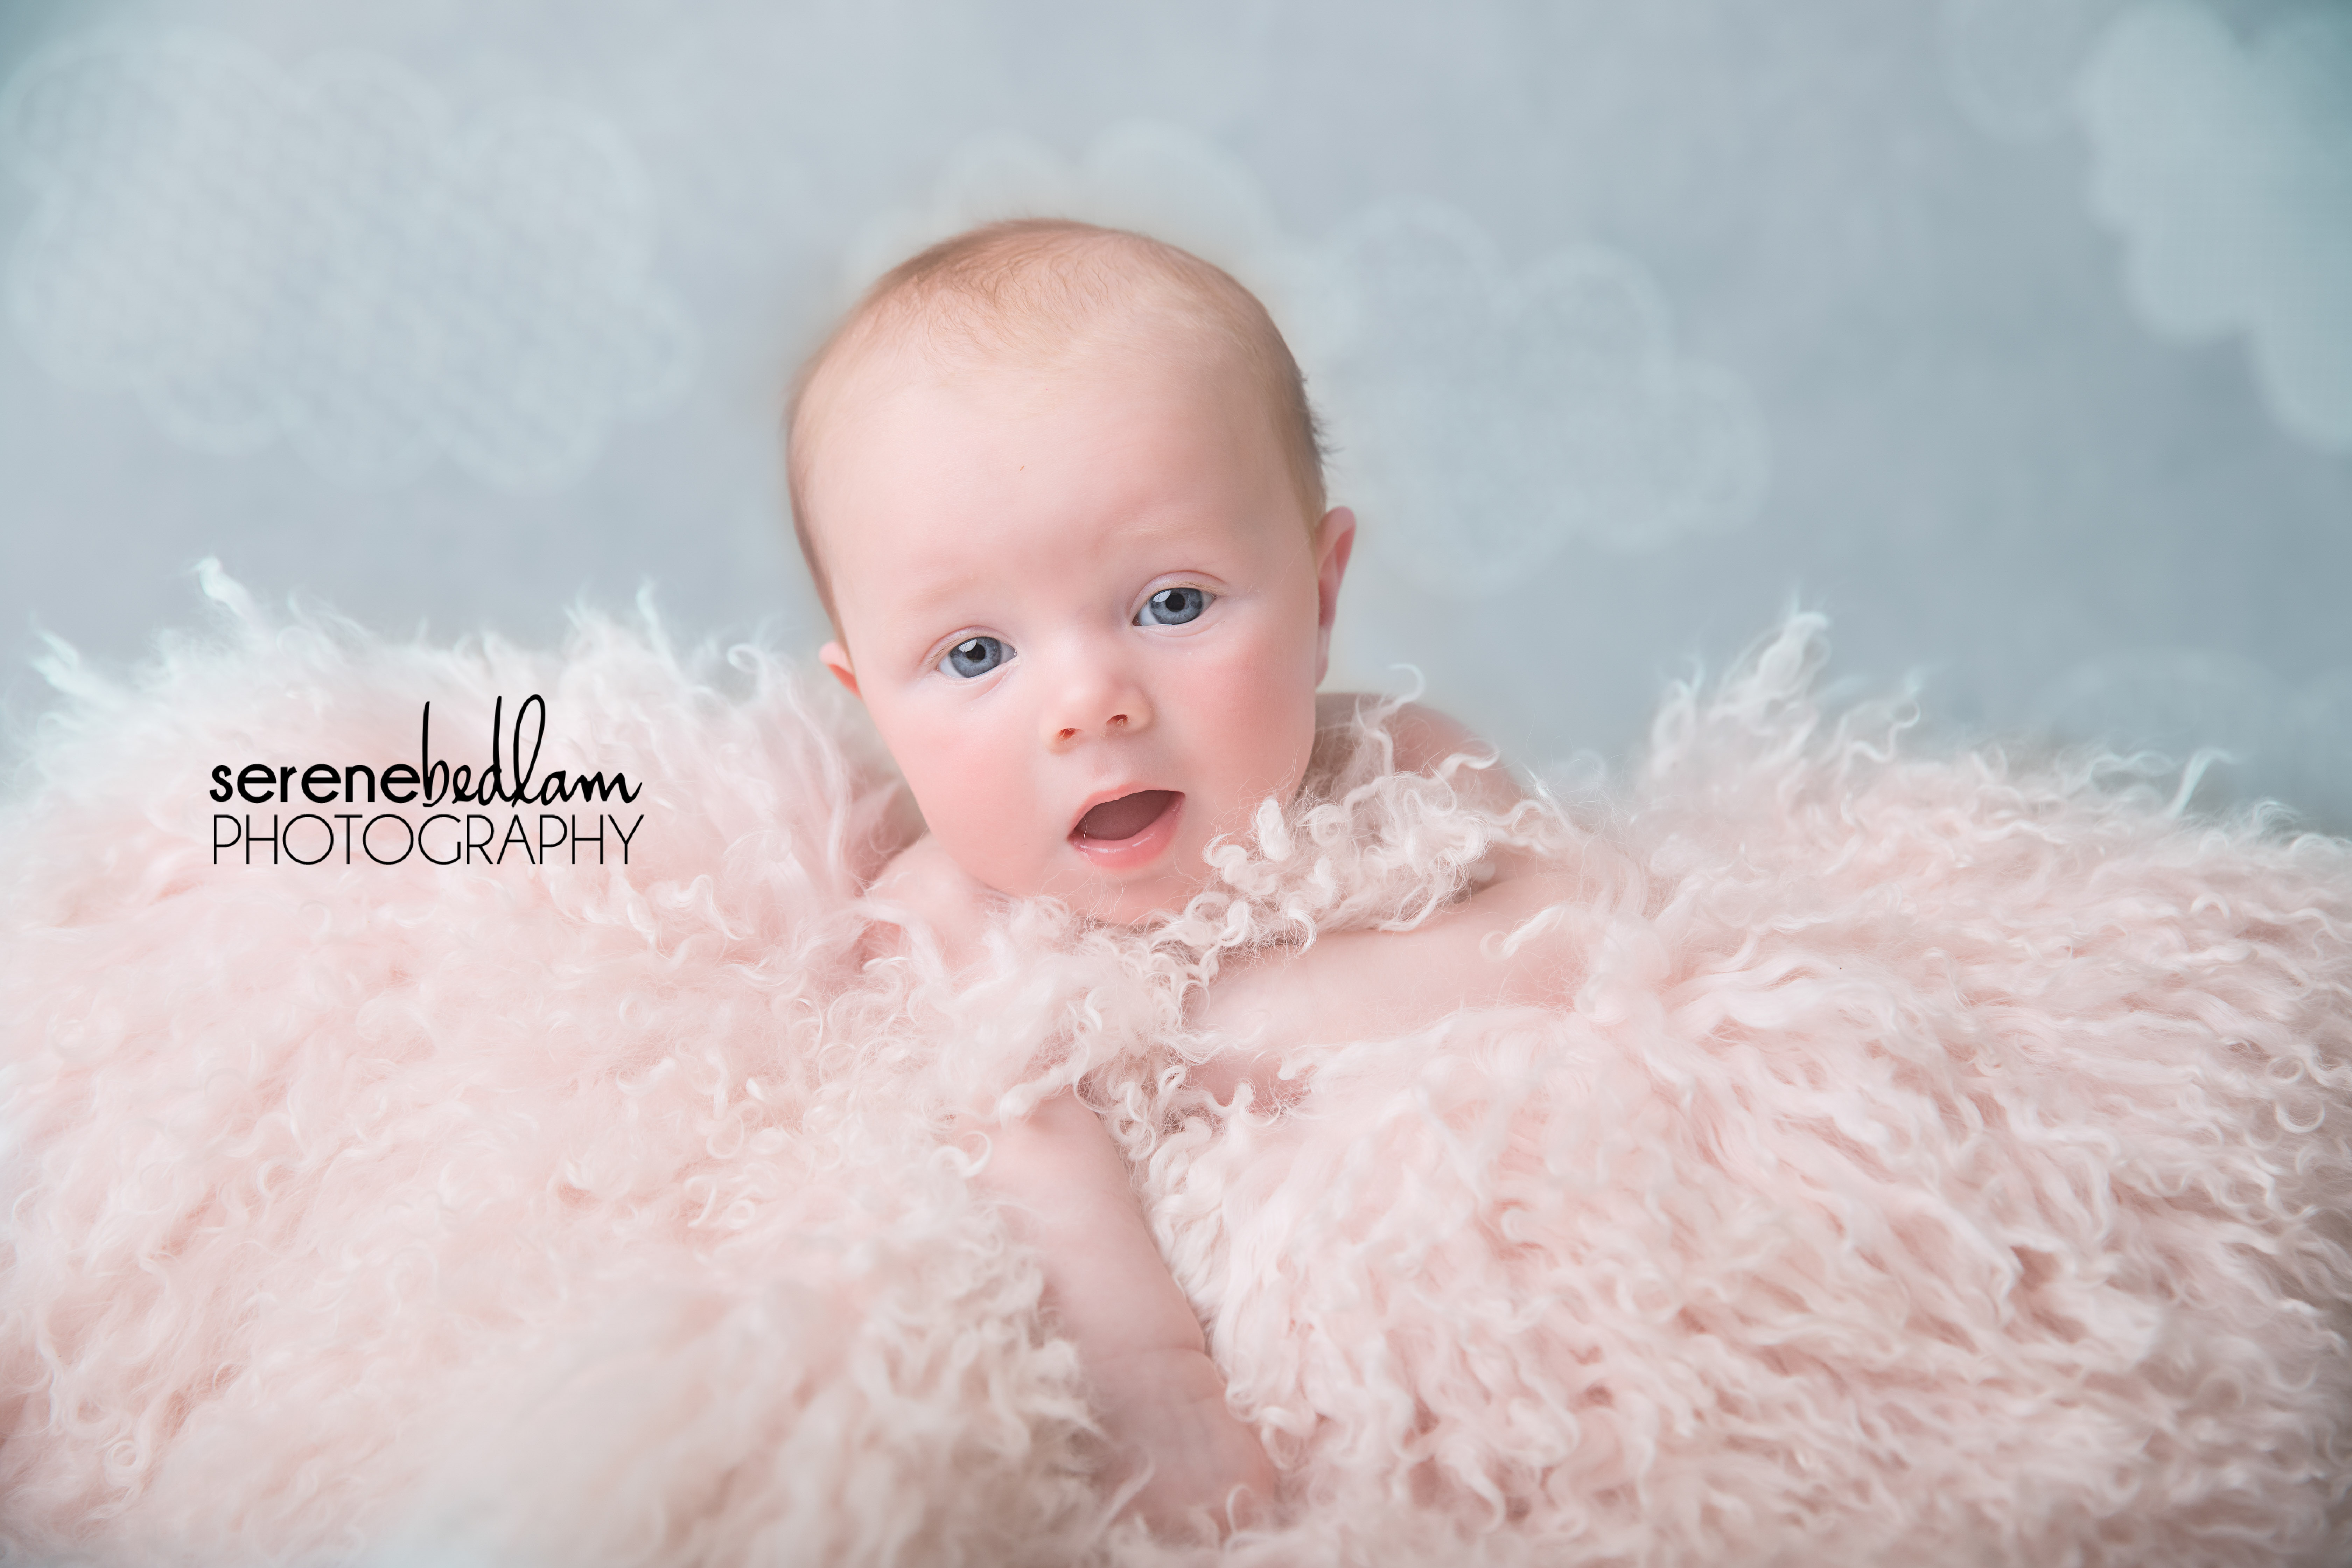 Serene Bedlam Newman 3 month milestone photography Milla